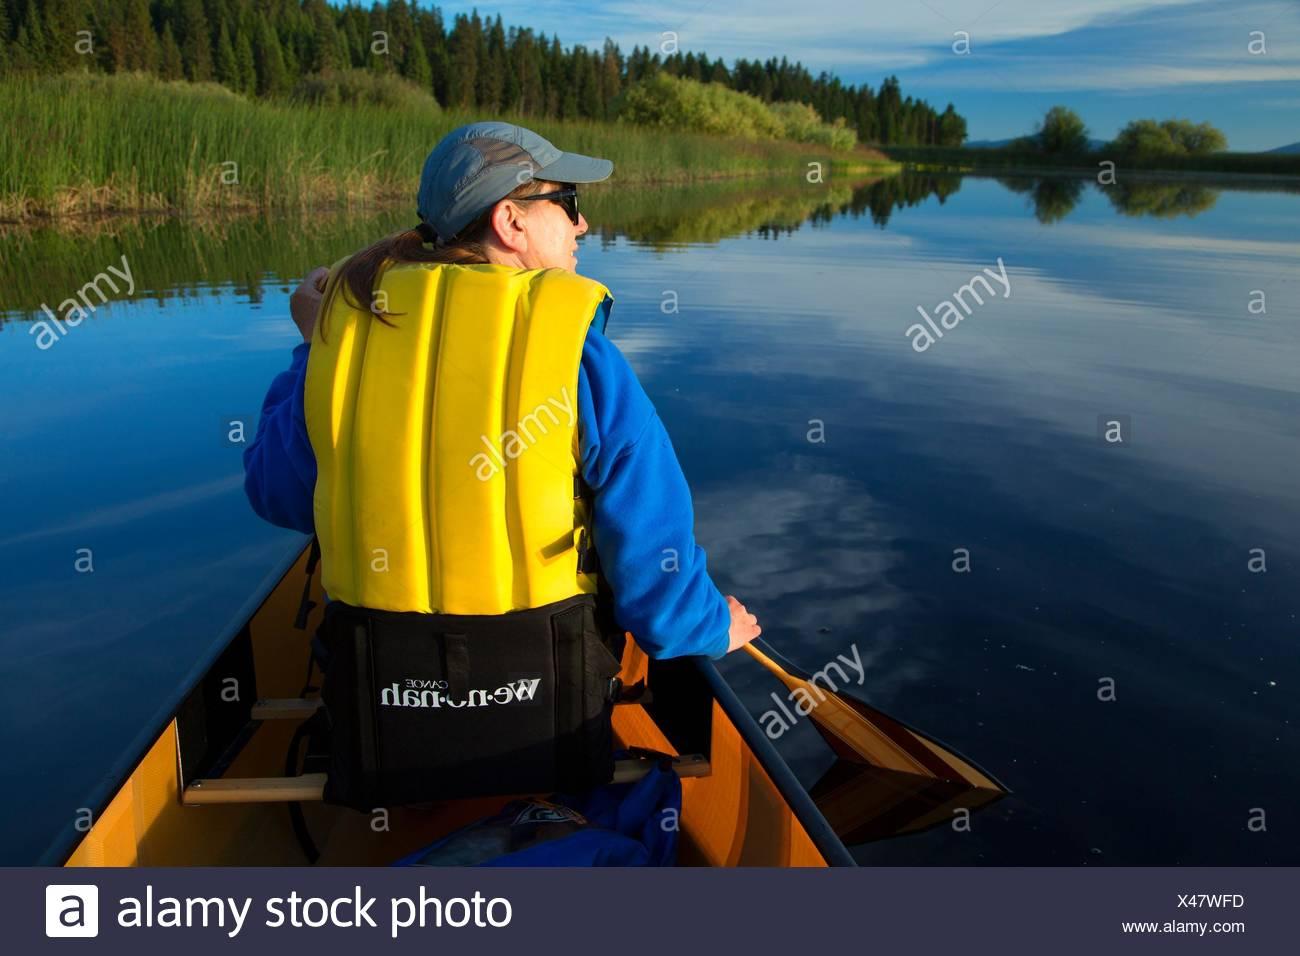 Upper Klamath Canoe Trail, Winema National Forest, Volcanic Legacy Scenic Byway, Oregon. - Stock Image